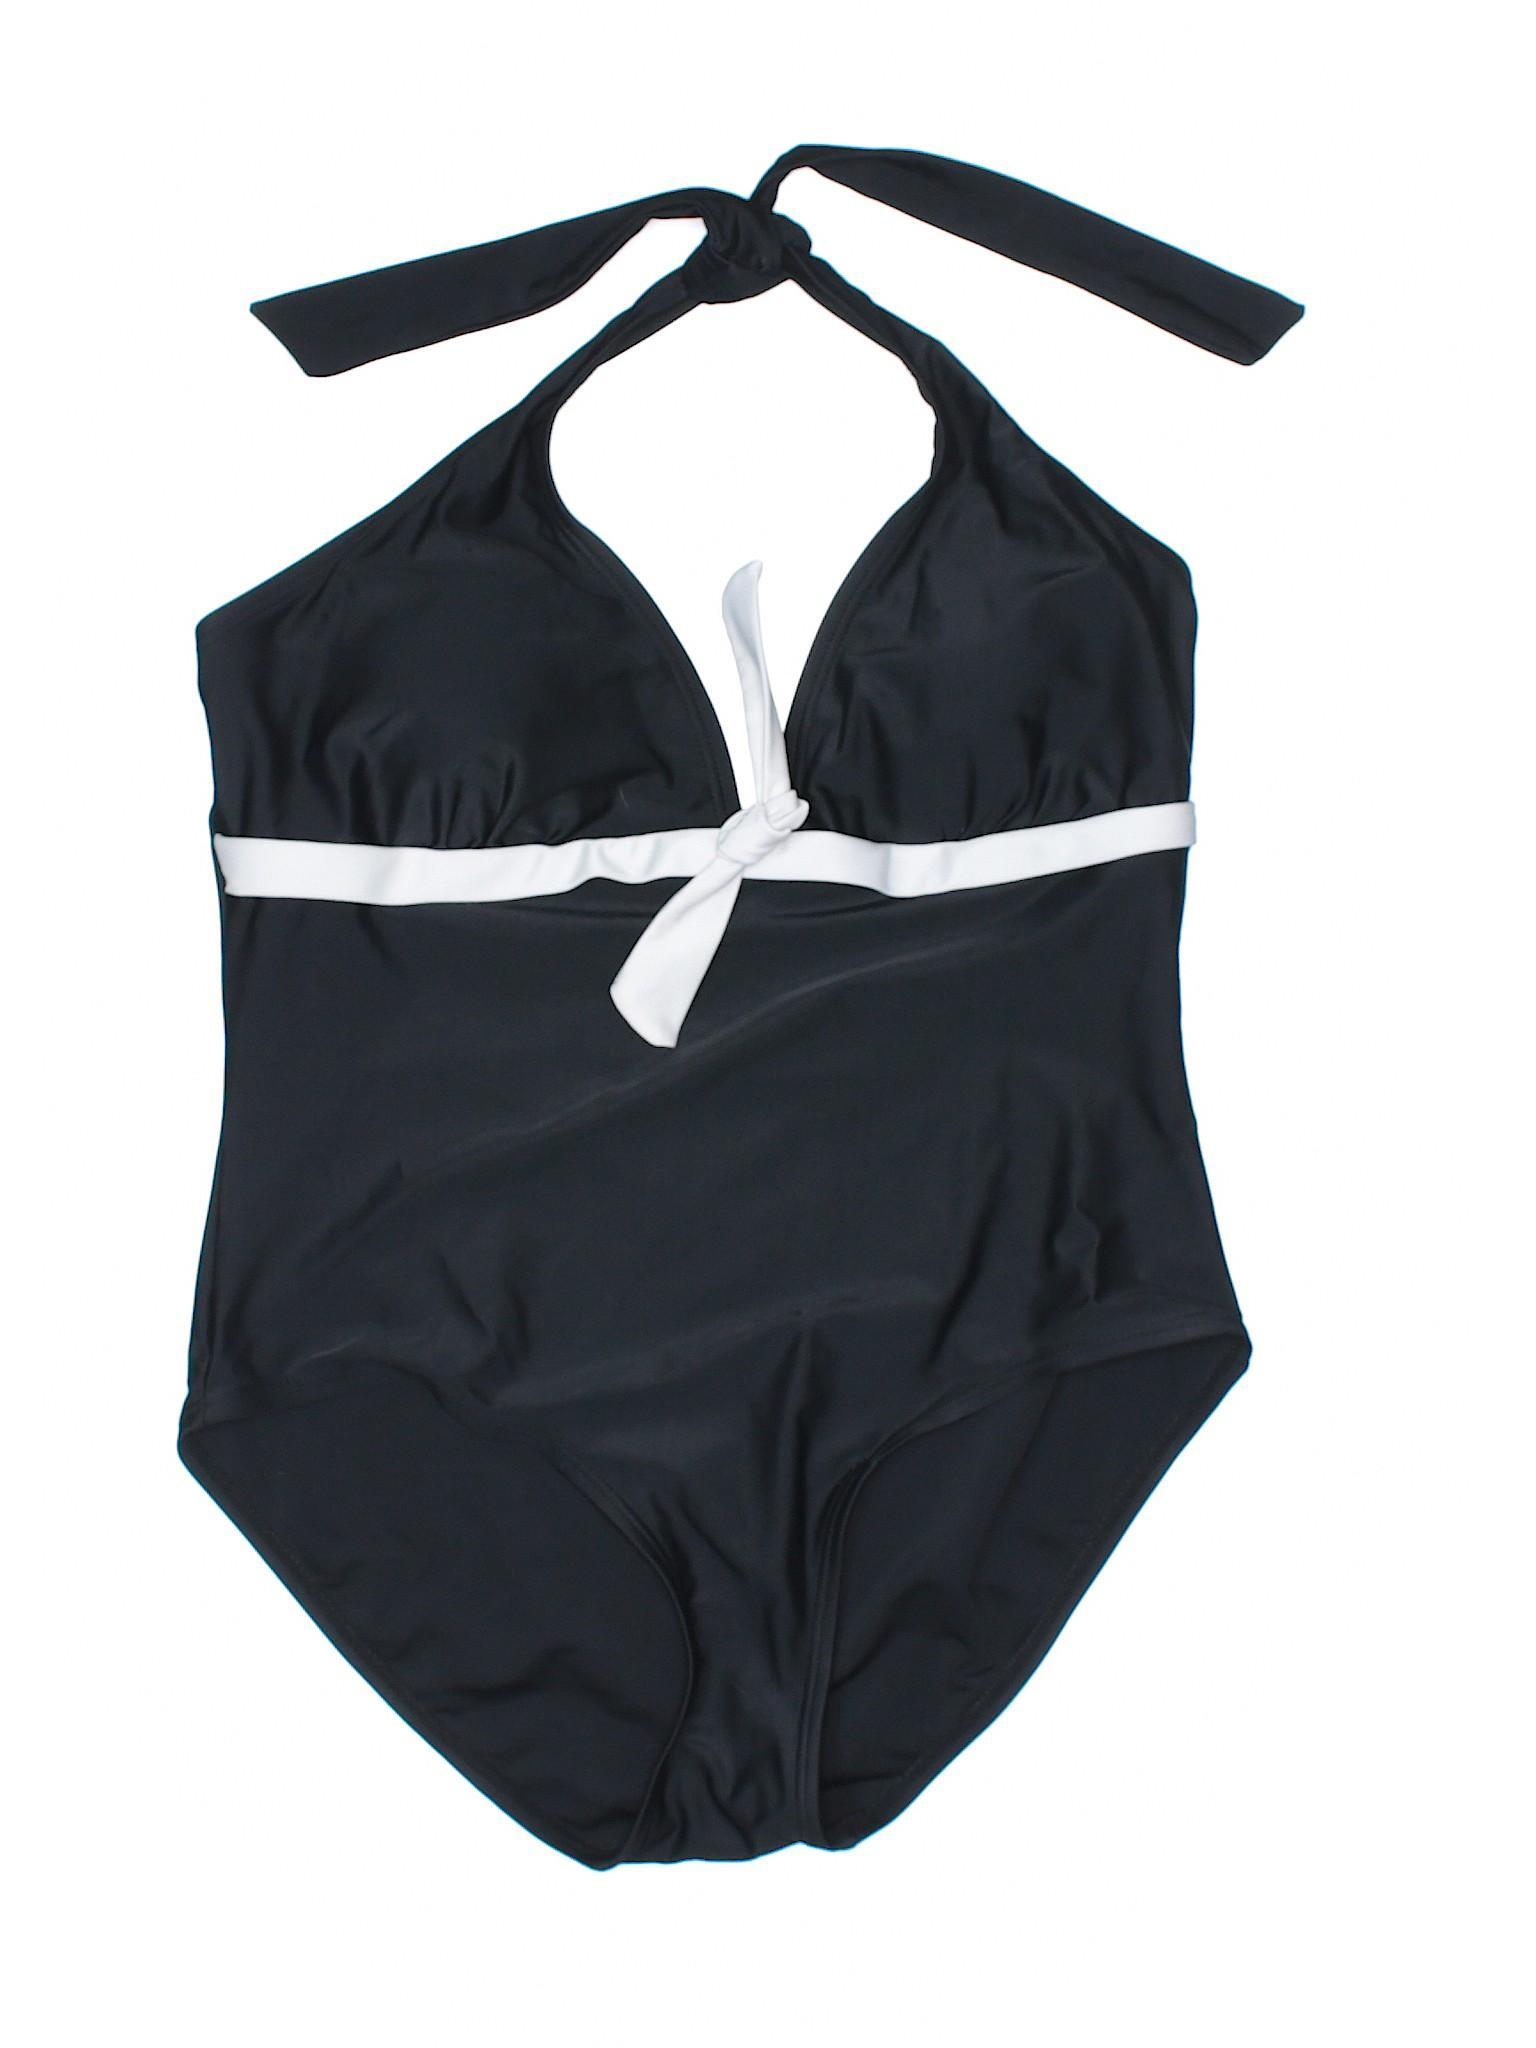 Piece Boutique One One Islander Islander Piece Swimsuit Boutique Swimsuit Ix0APn